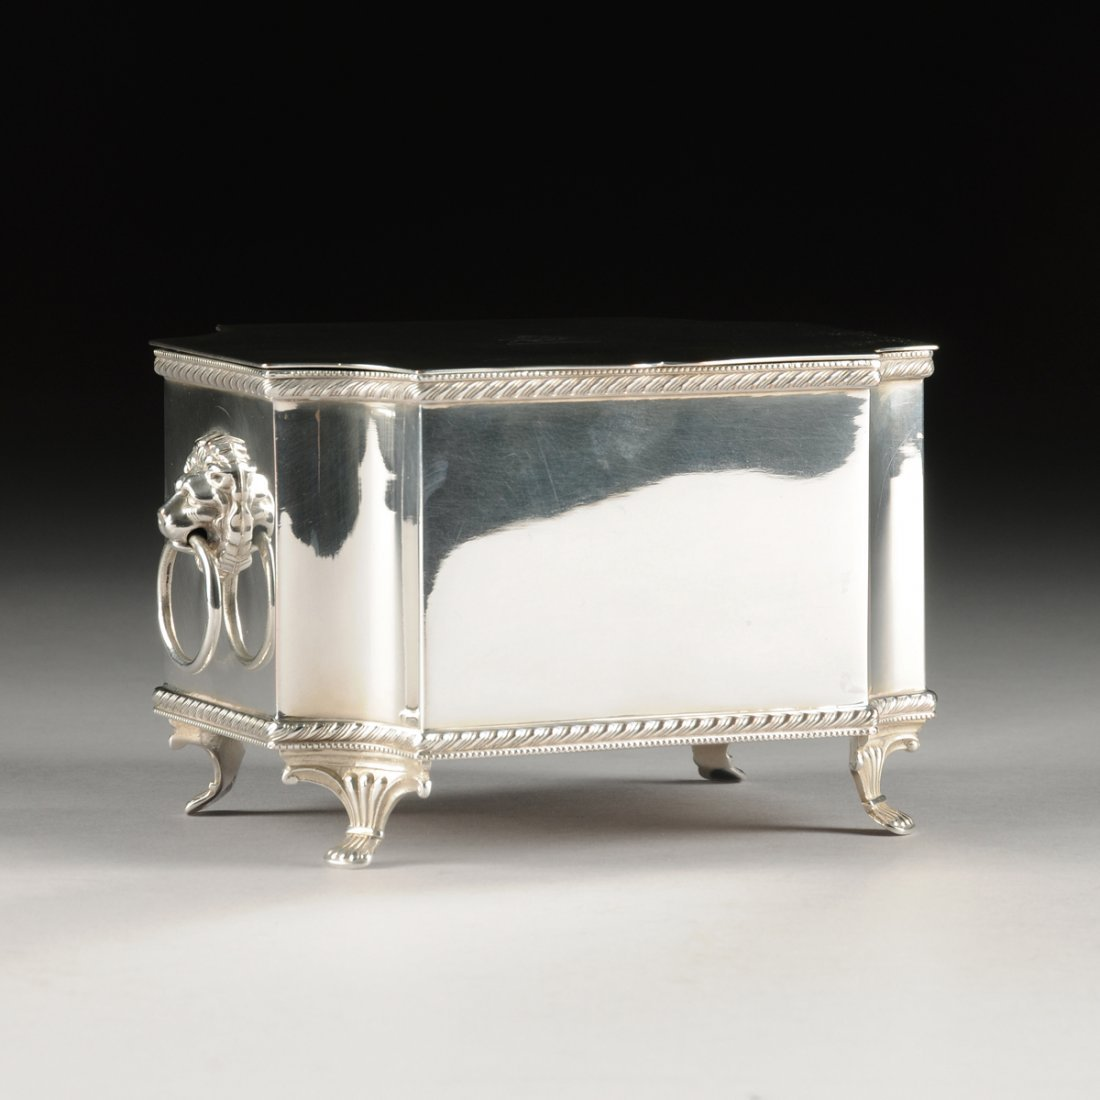 A GEORGE III STYLE SILVER PLATED COPPER KEEPSAKE BOX,